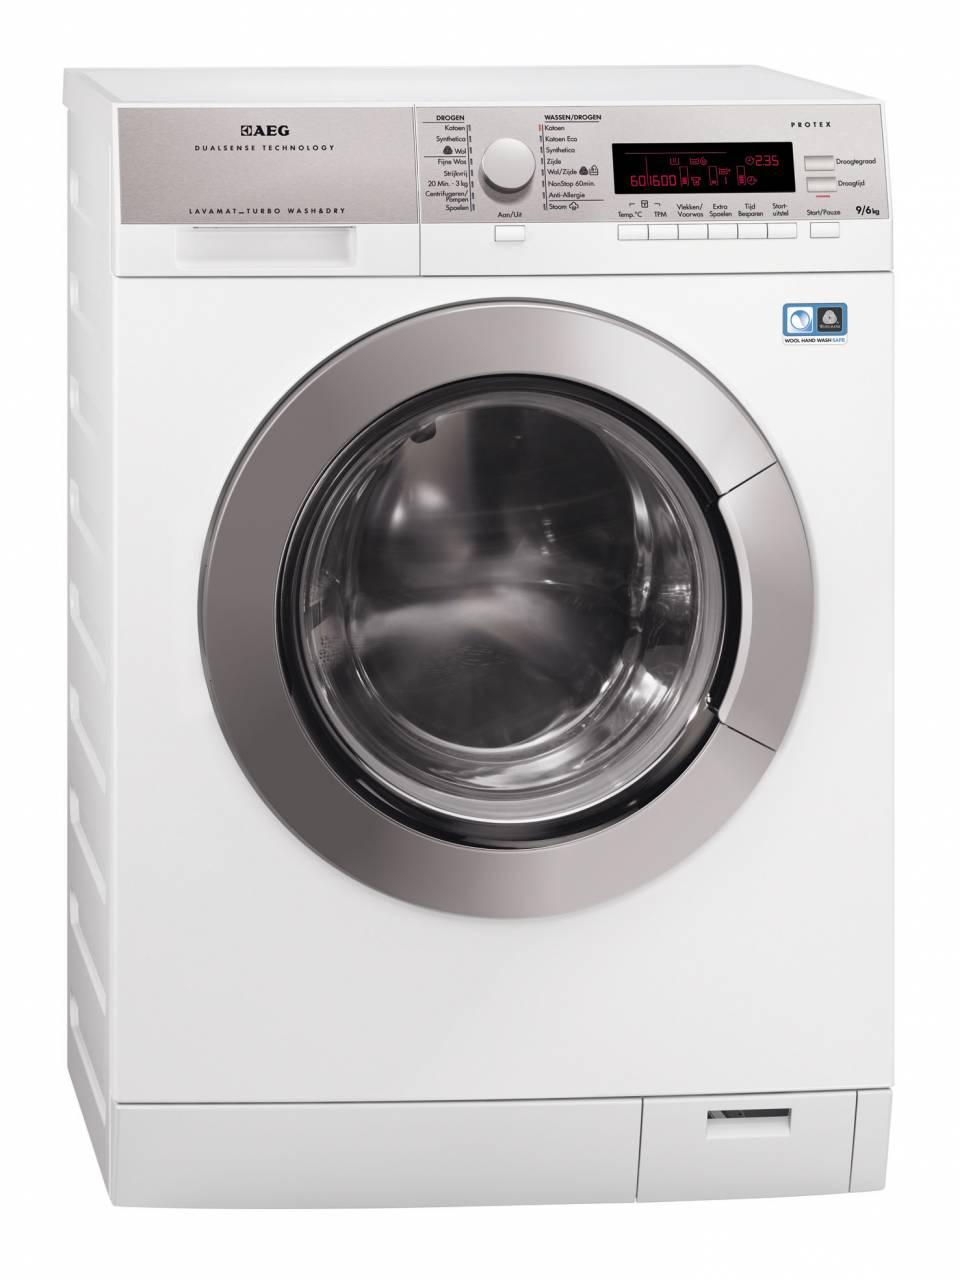 AEG Waschtrockner Lavamat DualSense mit Schontrommel.